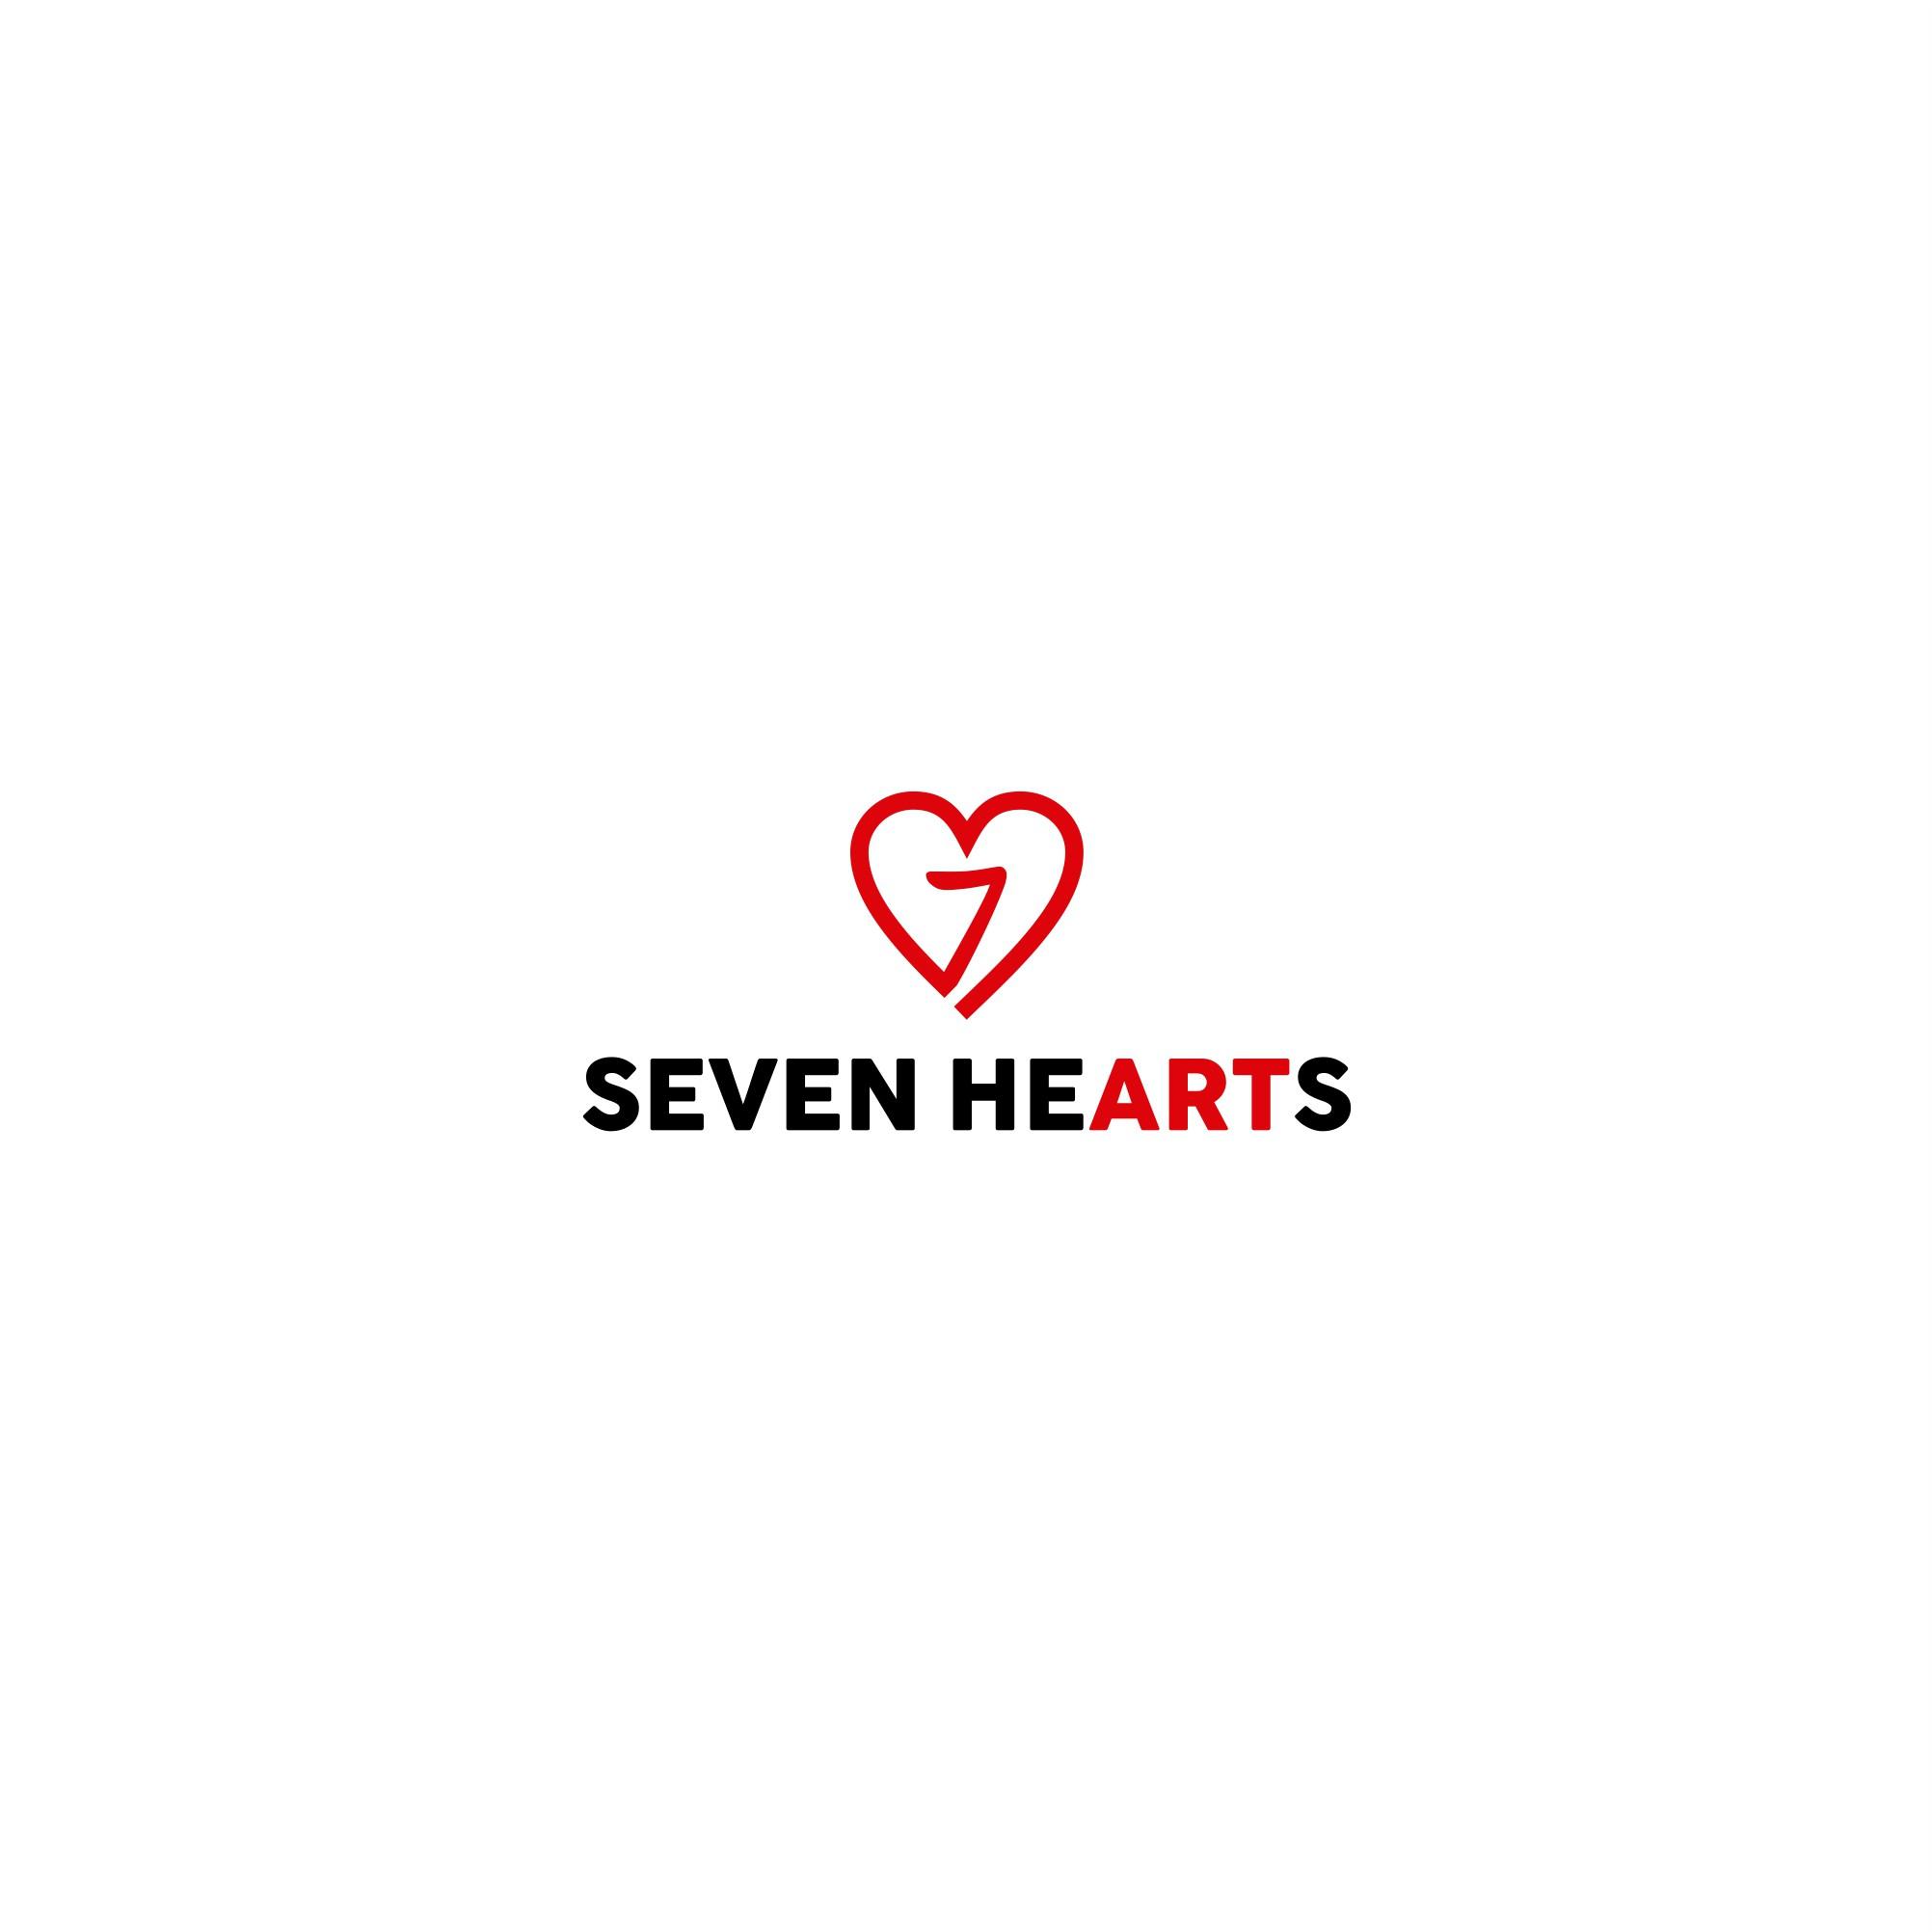 Seven Hearts